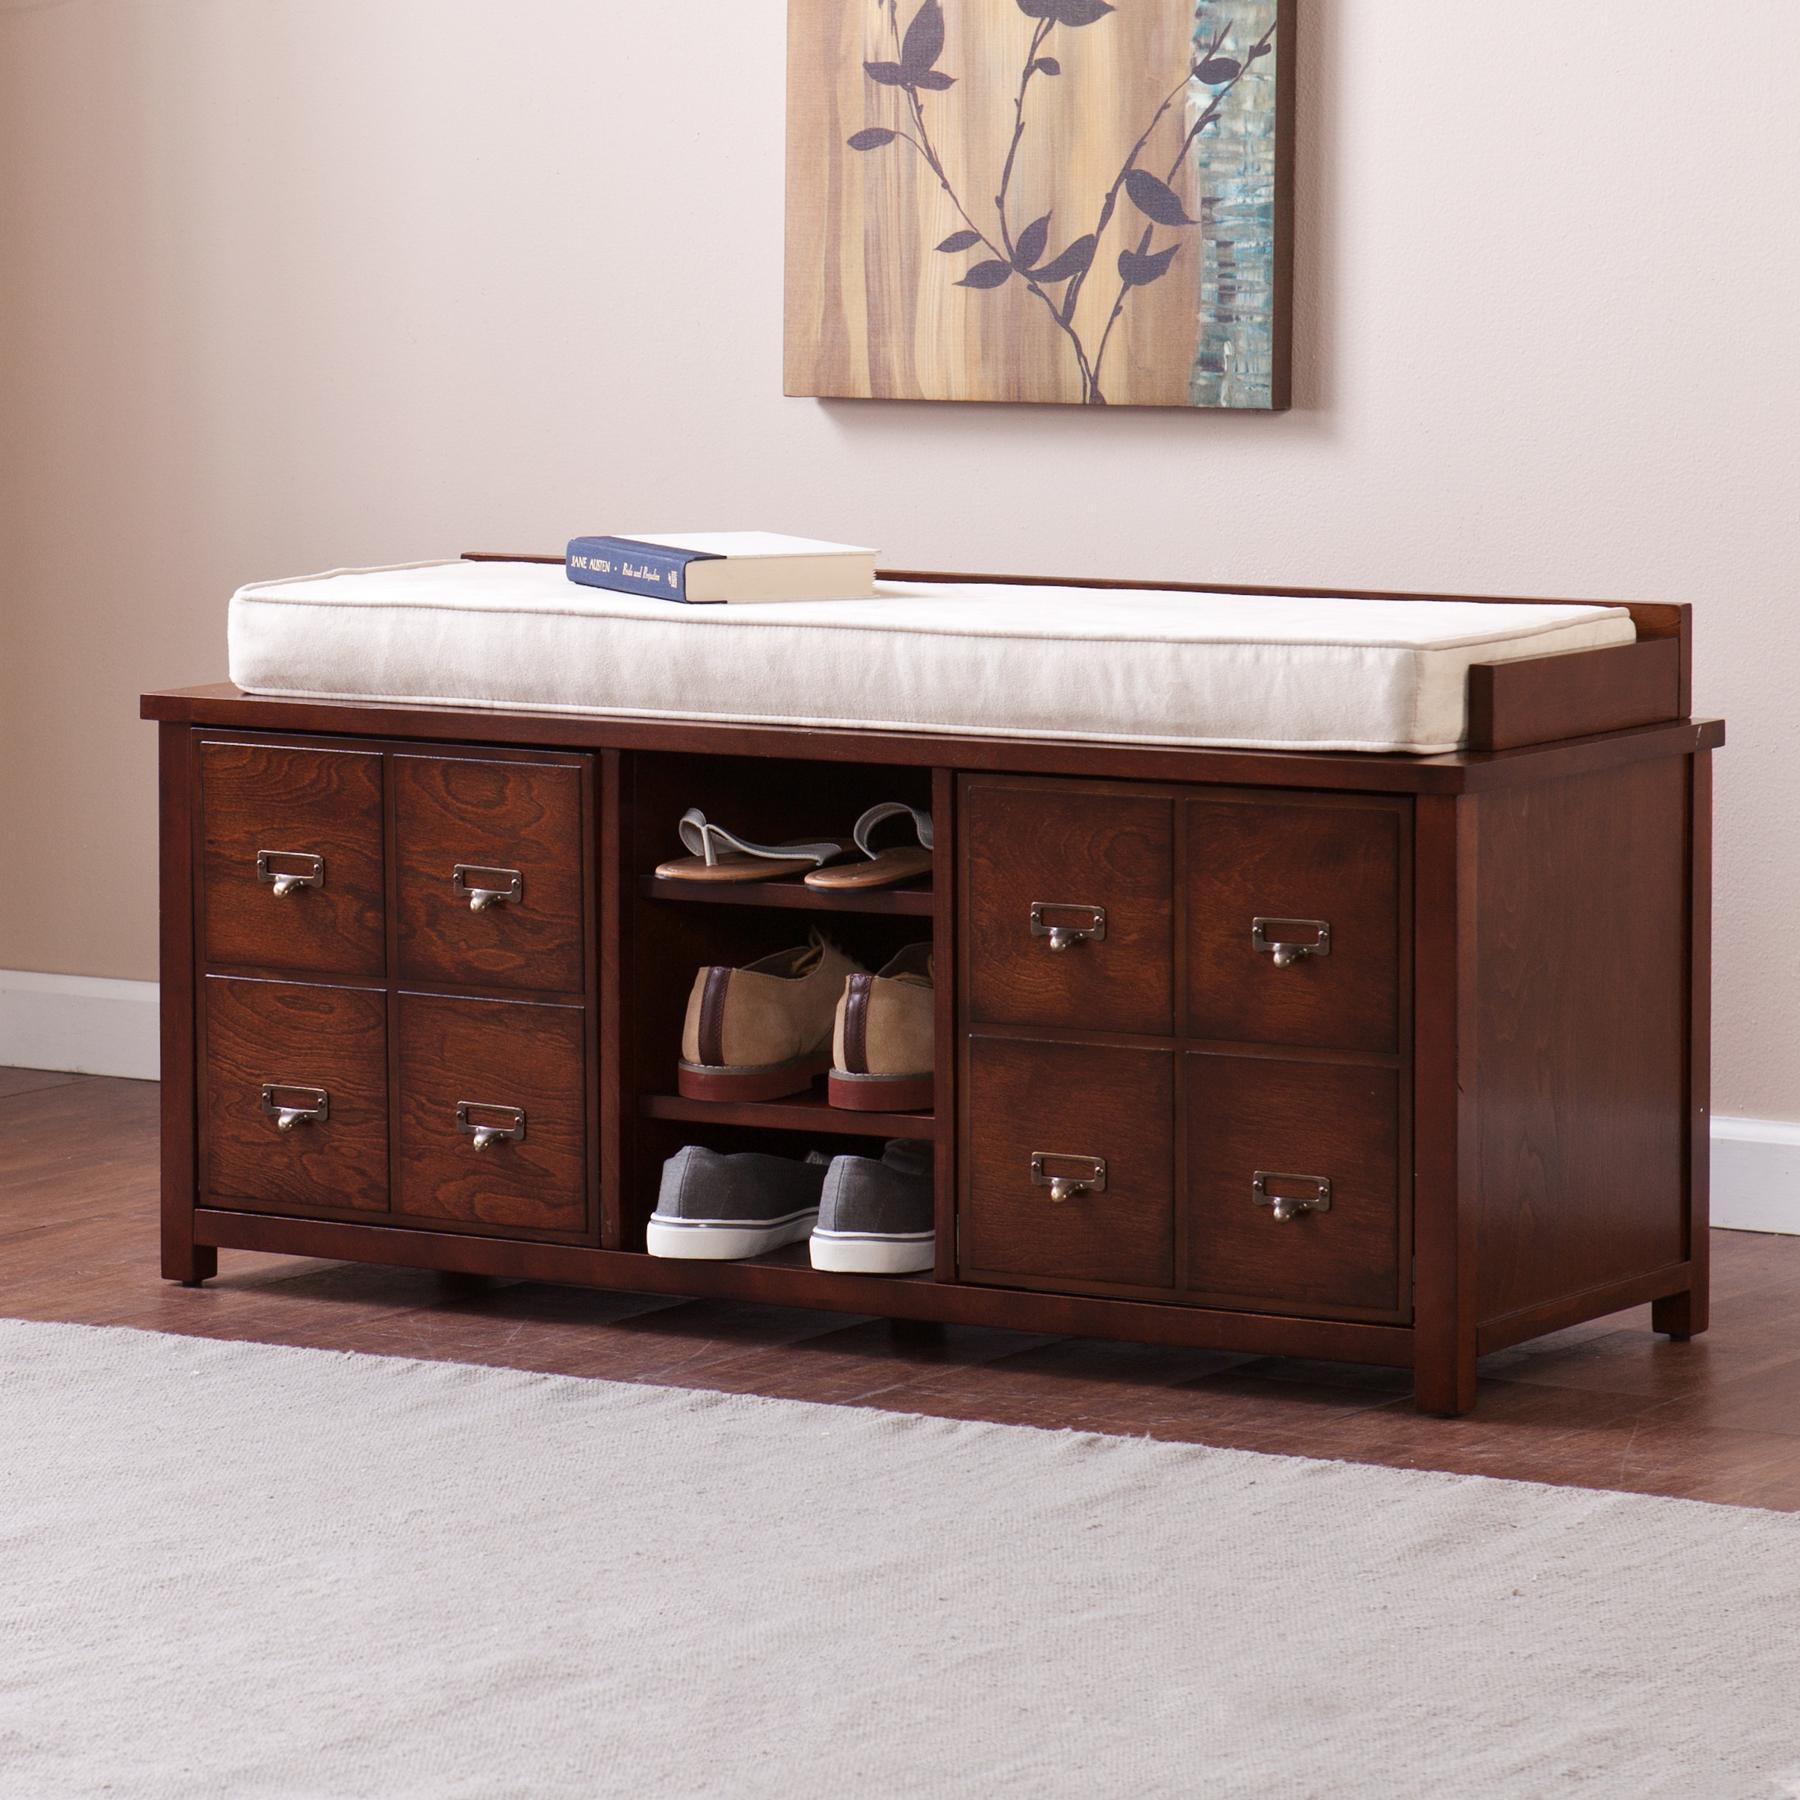 Southern Enterprises Alto Apothecary Storage Bench Large Dark Cherry Furniture